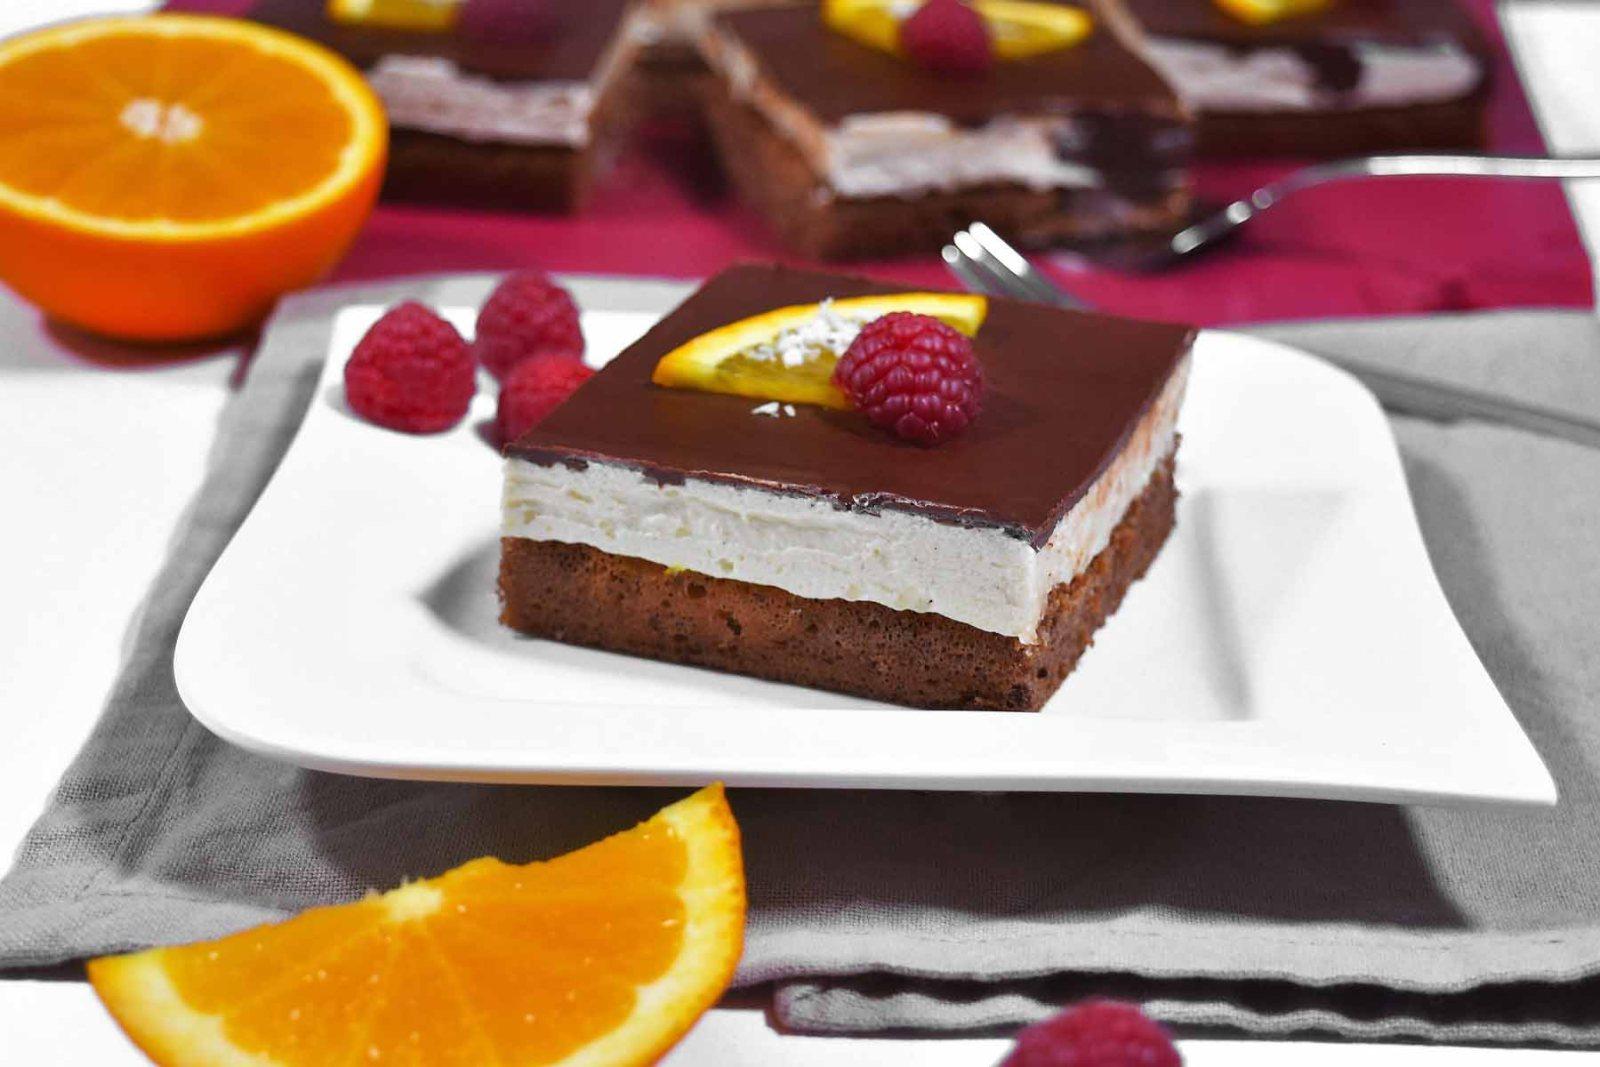 Orangen Schokoladen Kuchen Würfel-Rezept-ballesworld